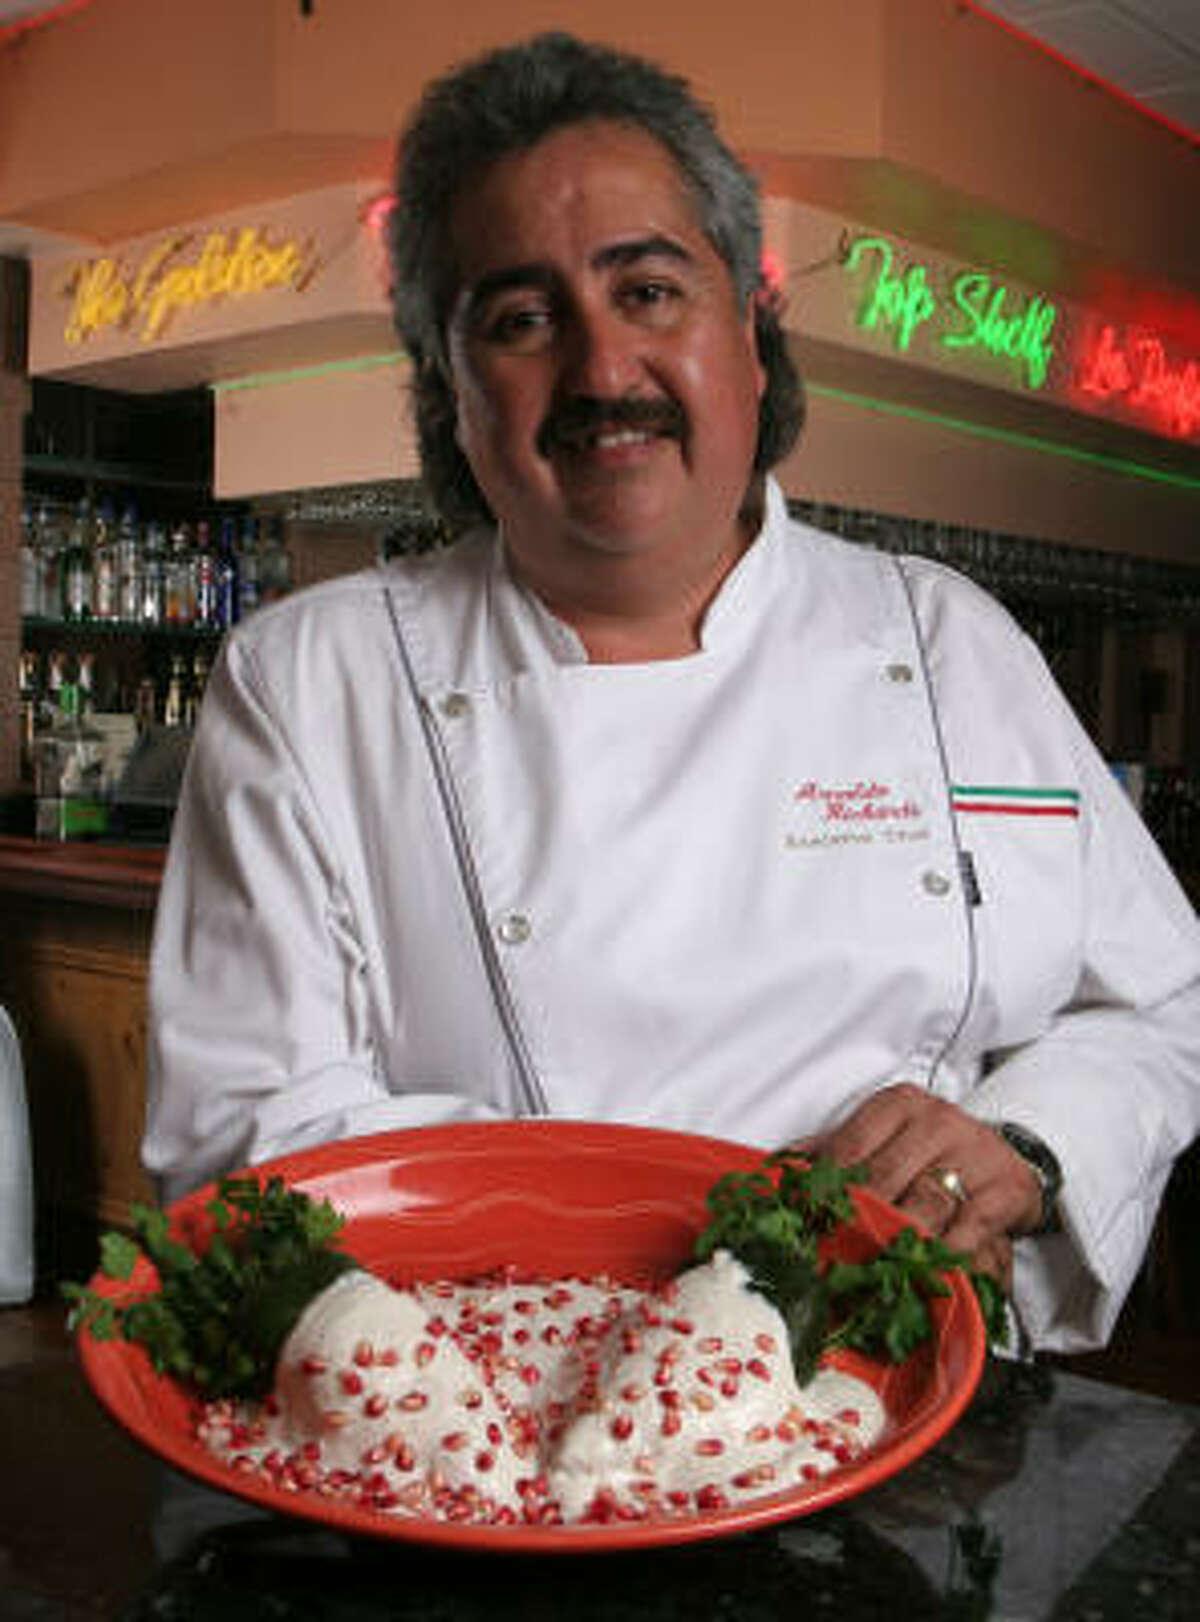 Arnaldo Richards shows off Chiles en Nogada from Pico's Mex-Mex.